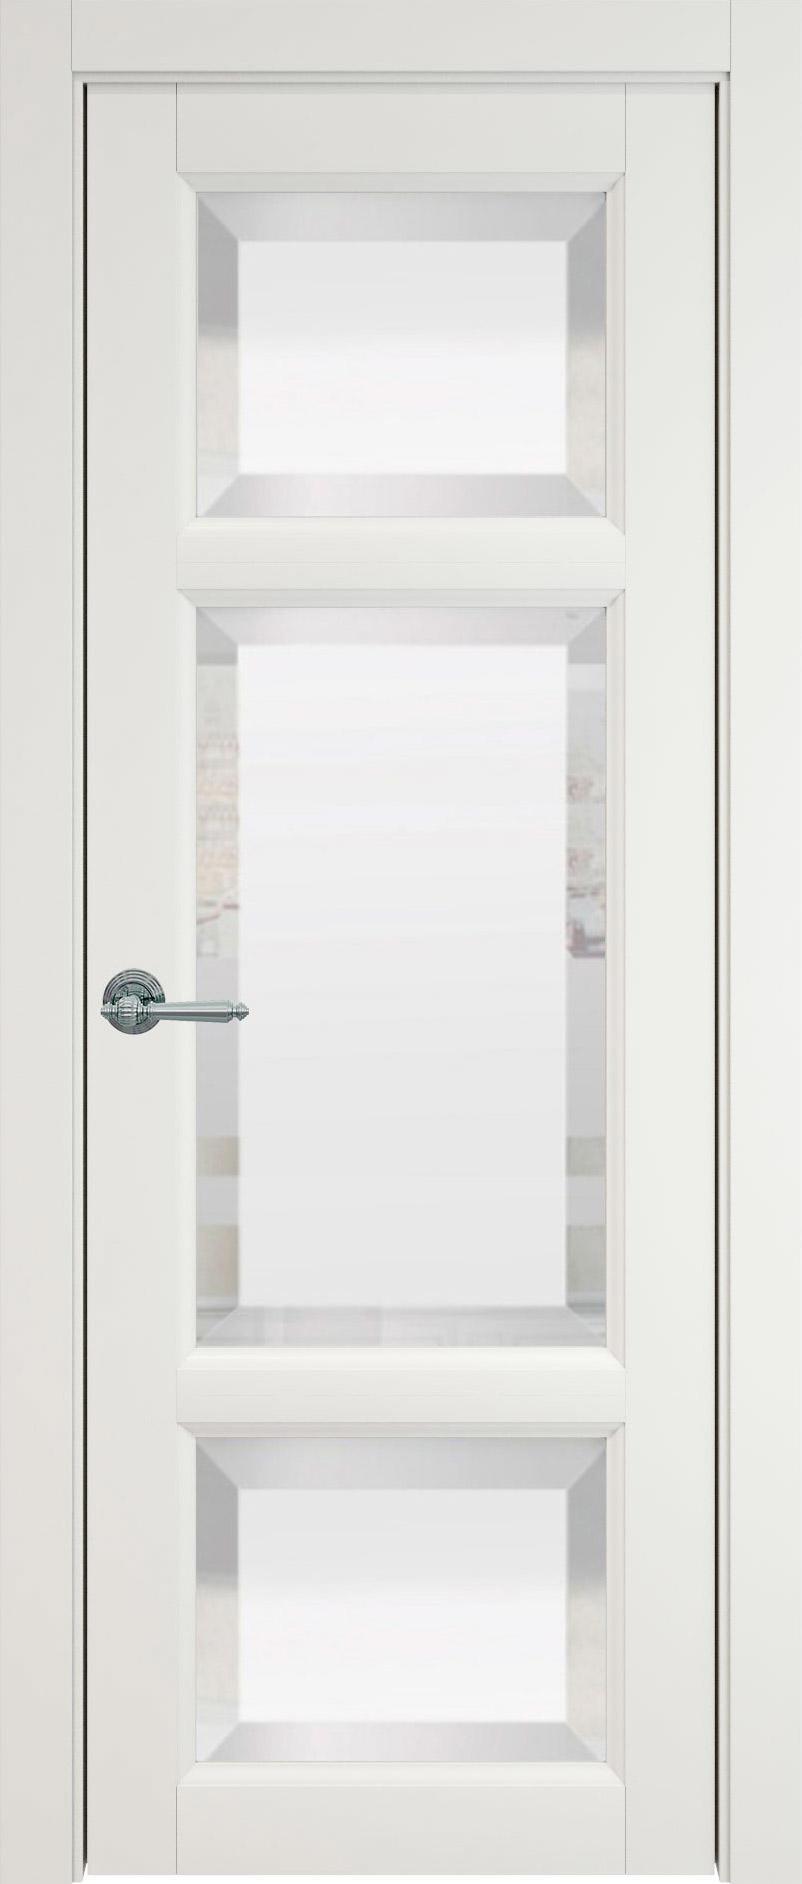 Siena цвет - Бежевая эмаль (RAL 9010) Со стеклом (ДО)